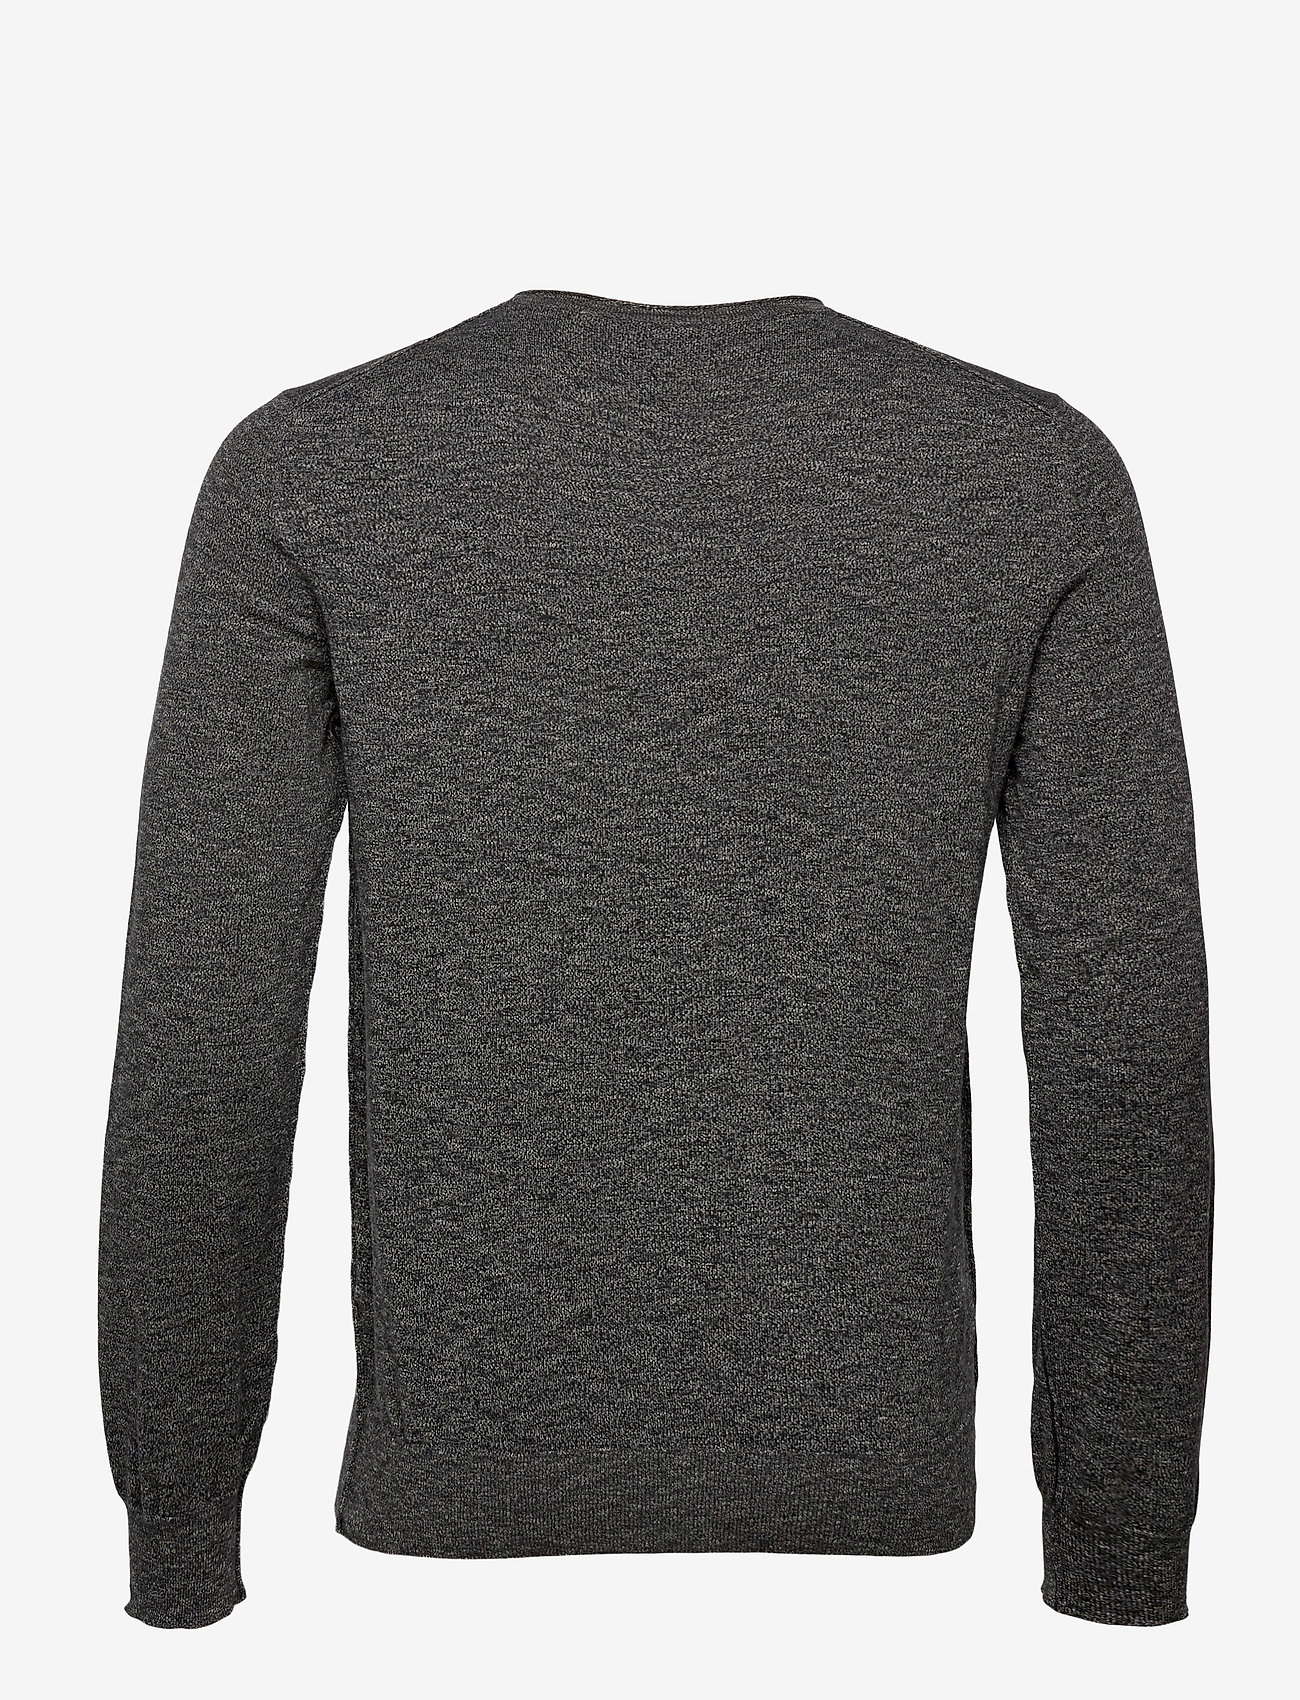 BOSS - Kabiron - tricots basiques - dark grey - 1